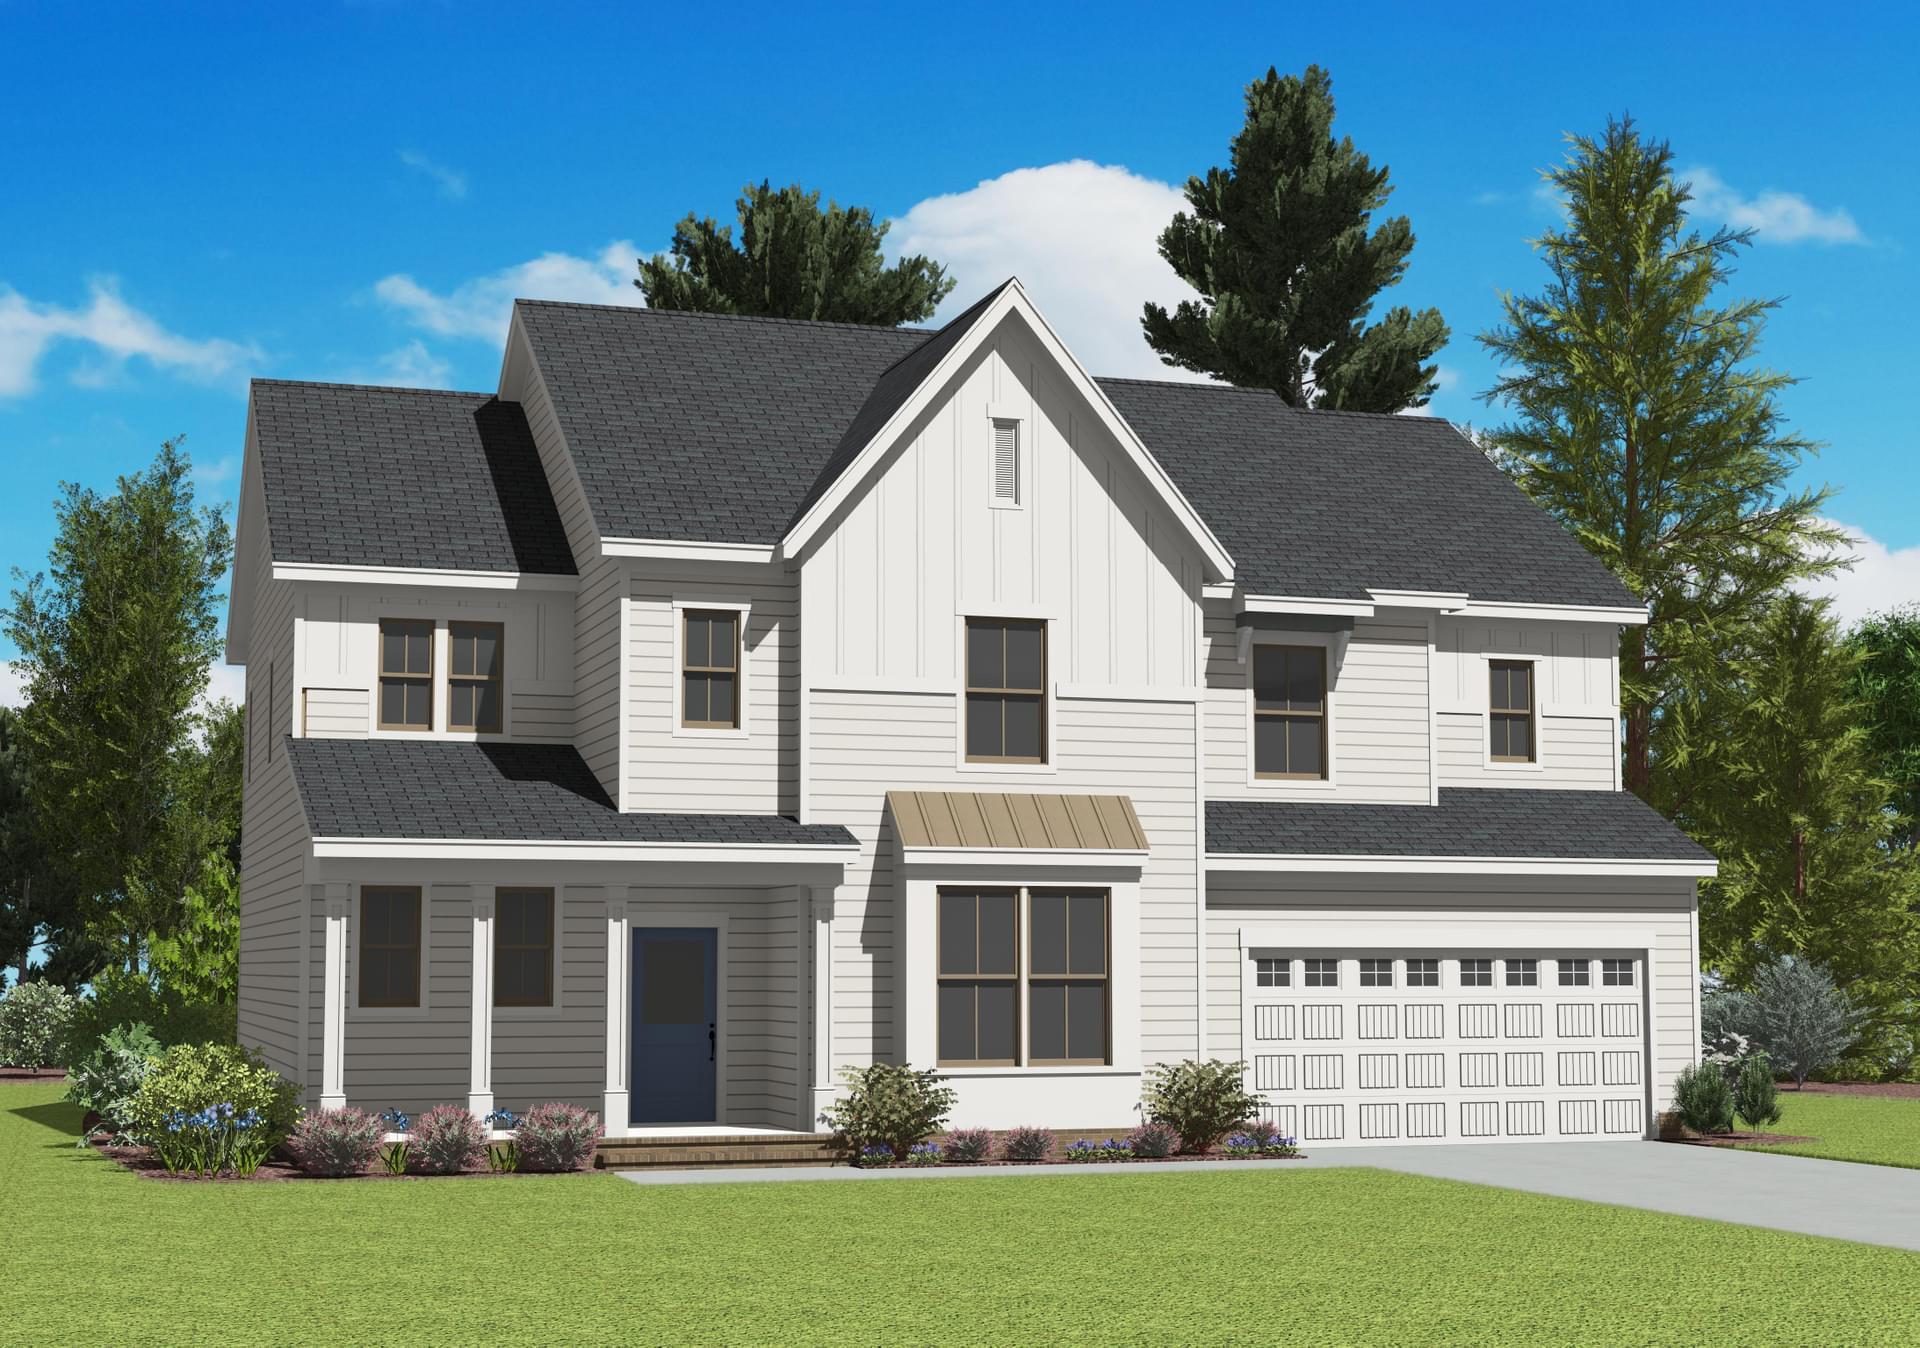 Hillsborough, NC Lot for Sale